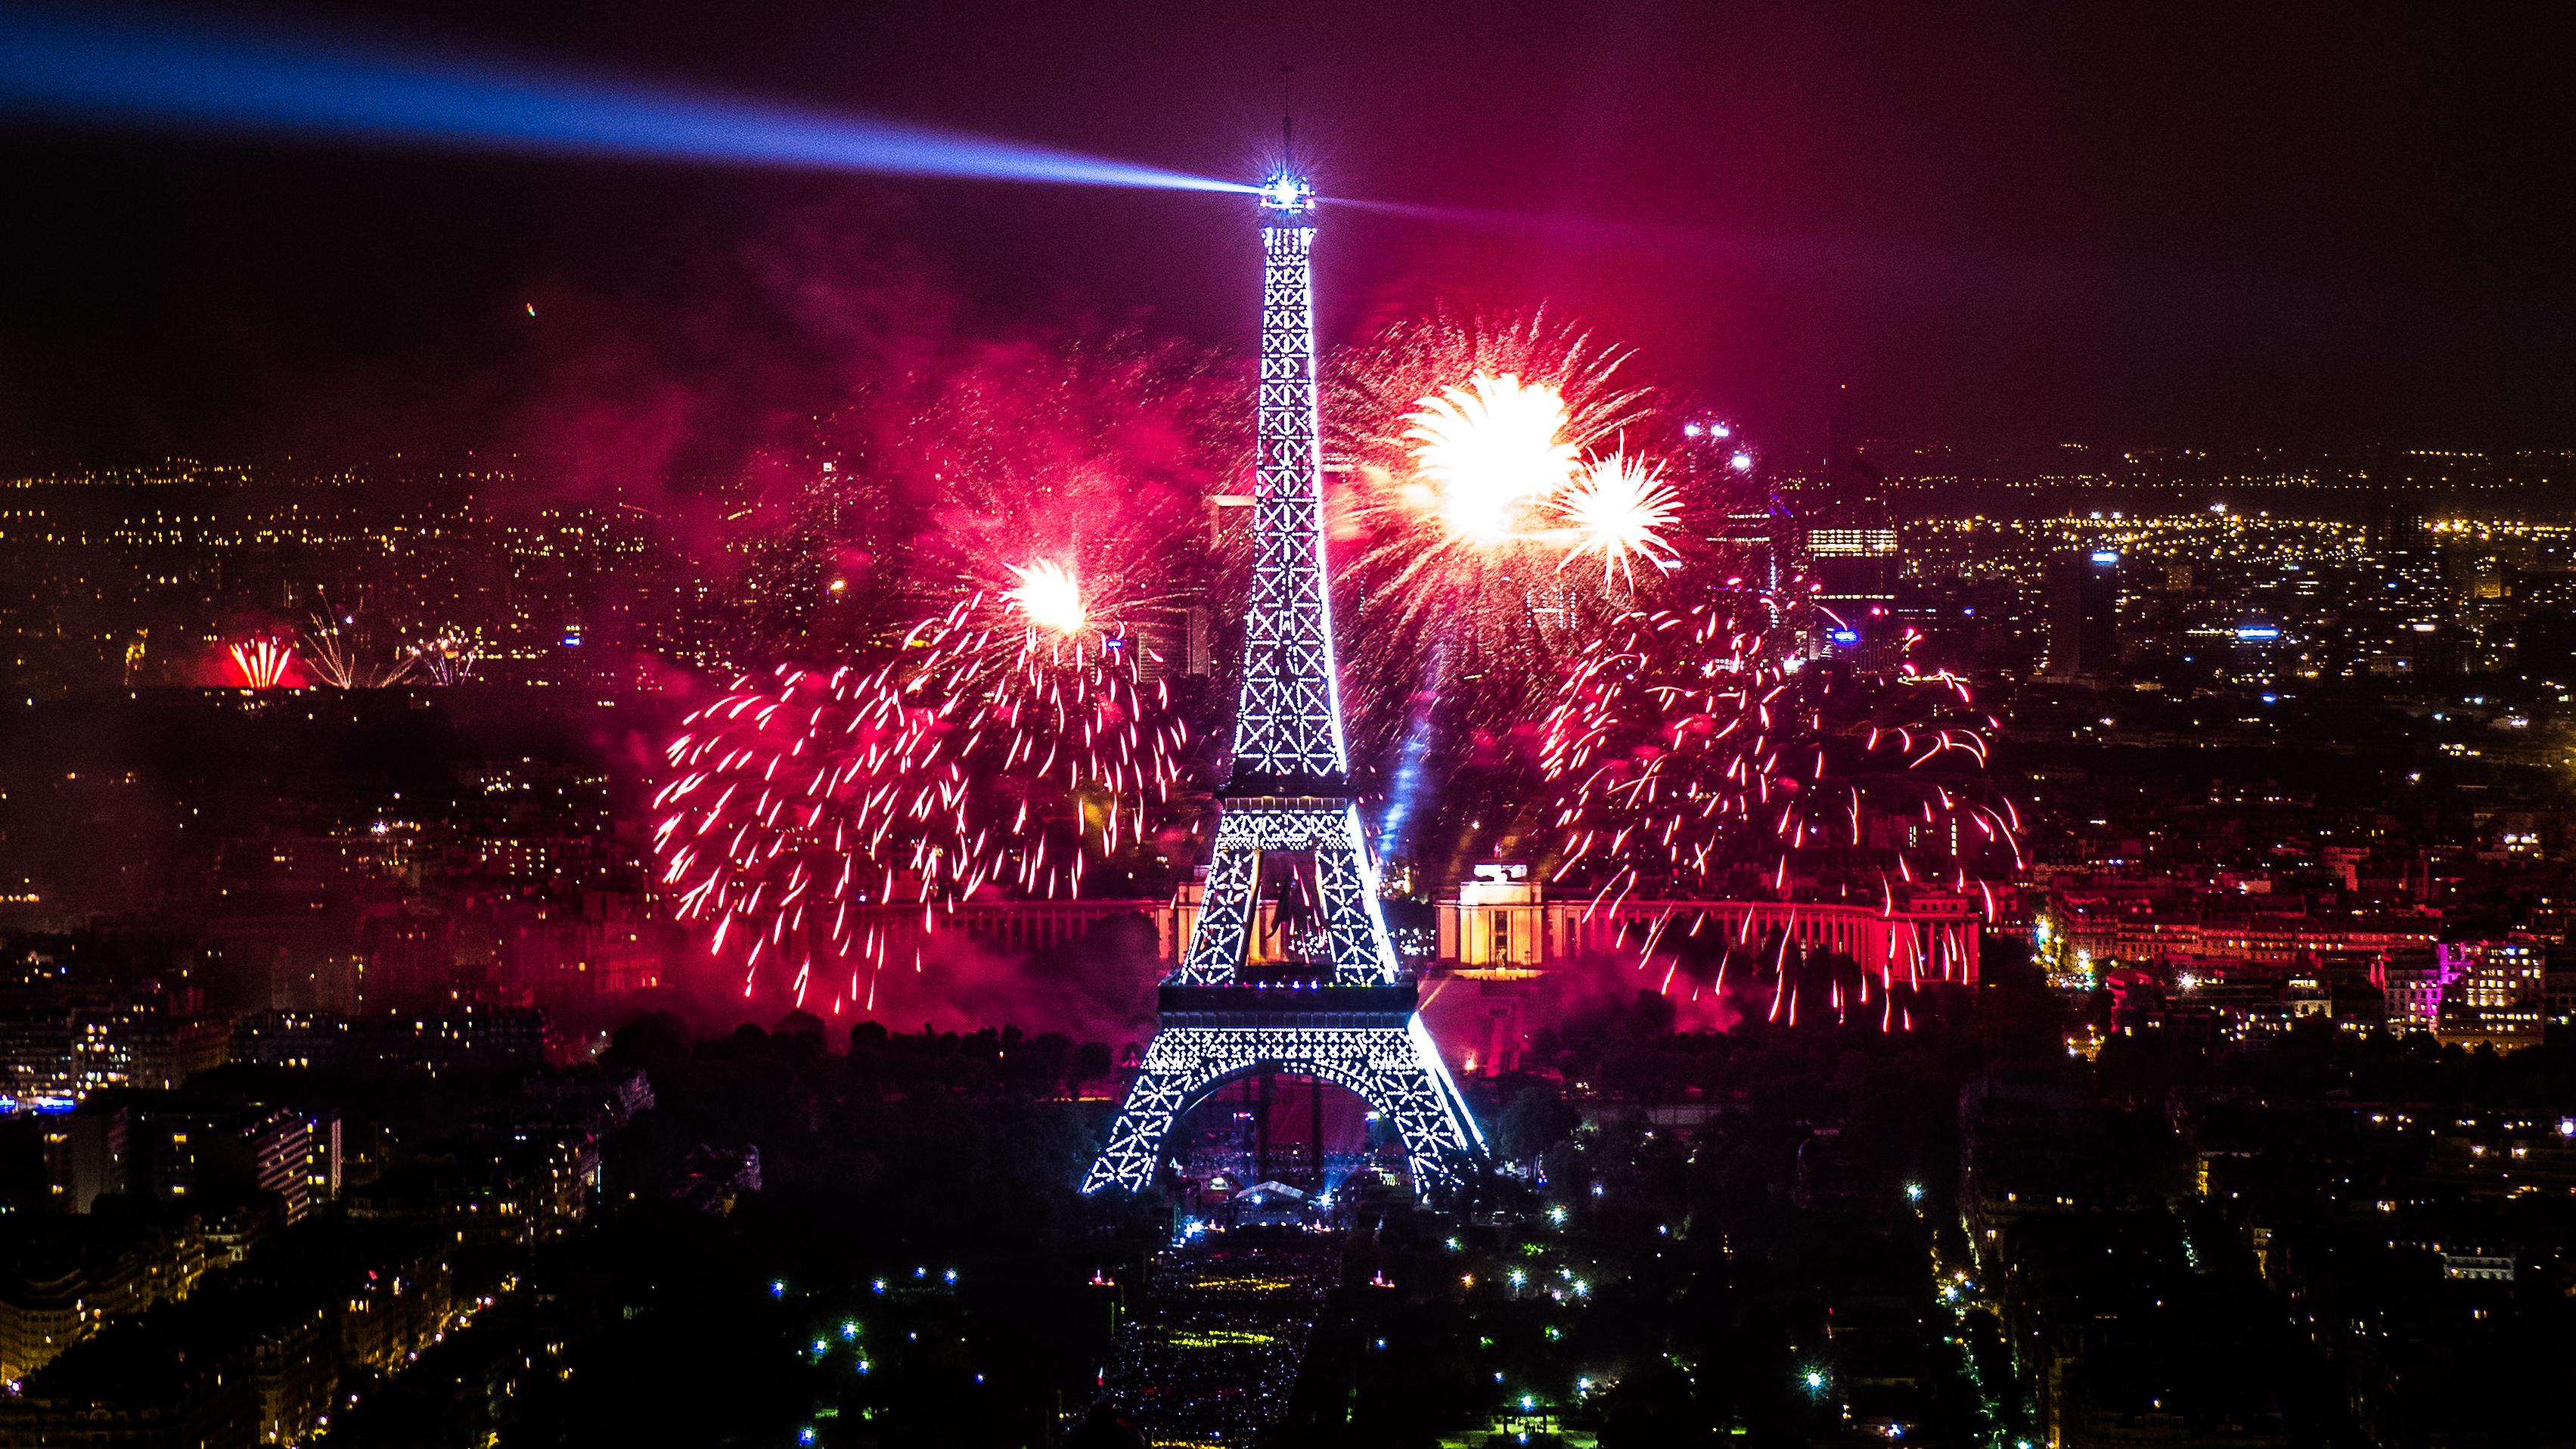 file:2013 fireworks on eiffel tower 38 - wikimedia commons